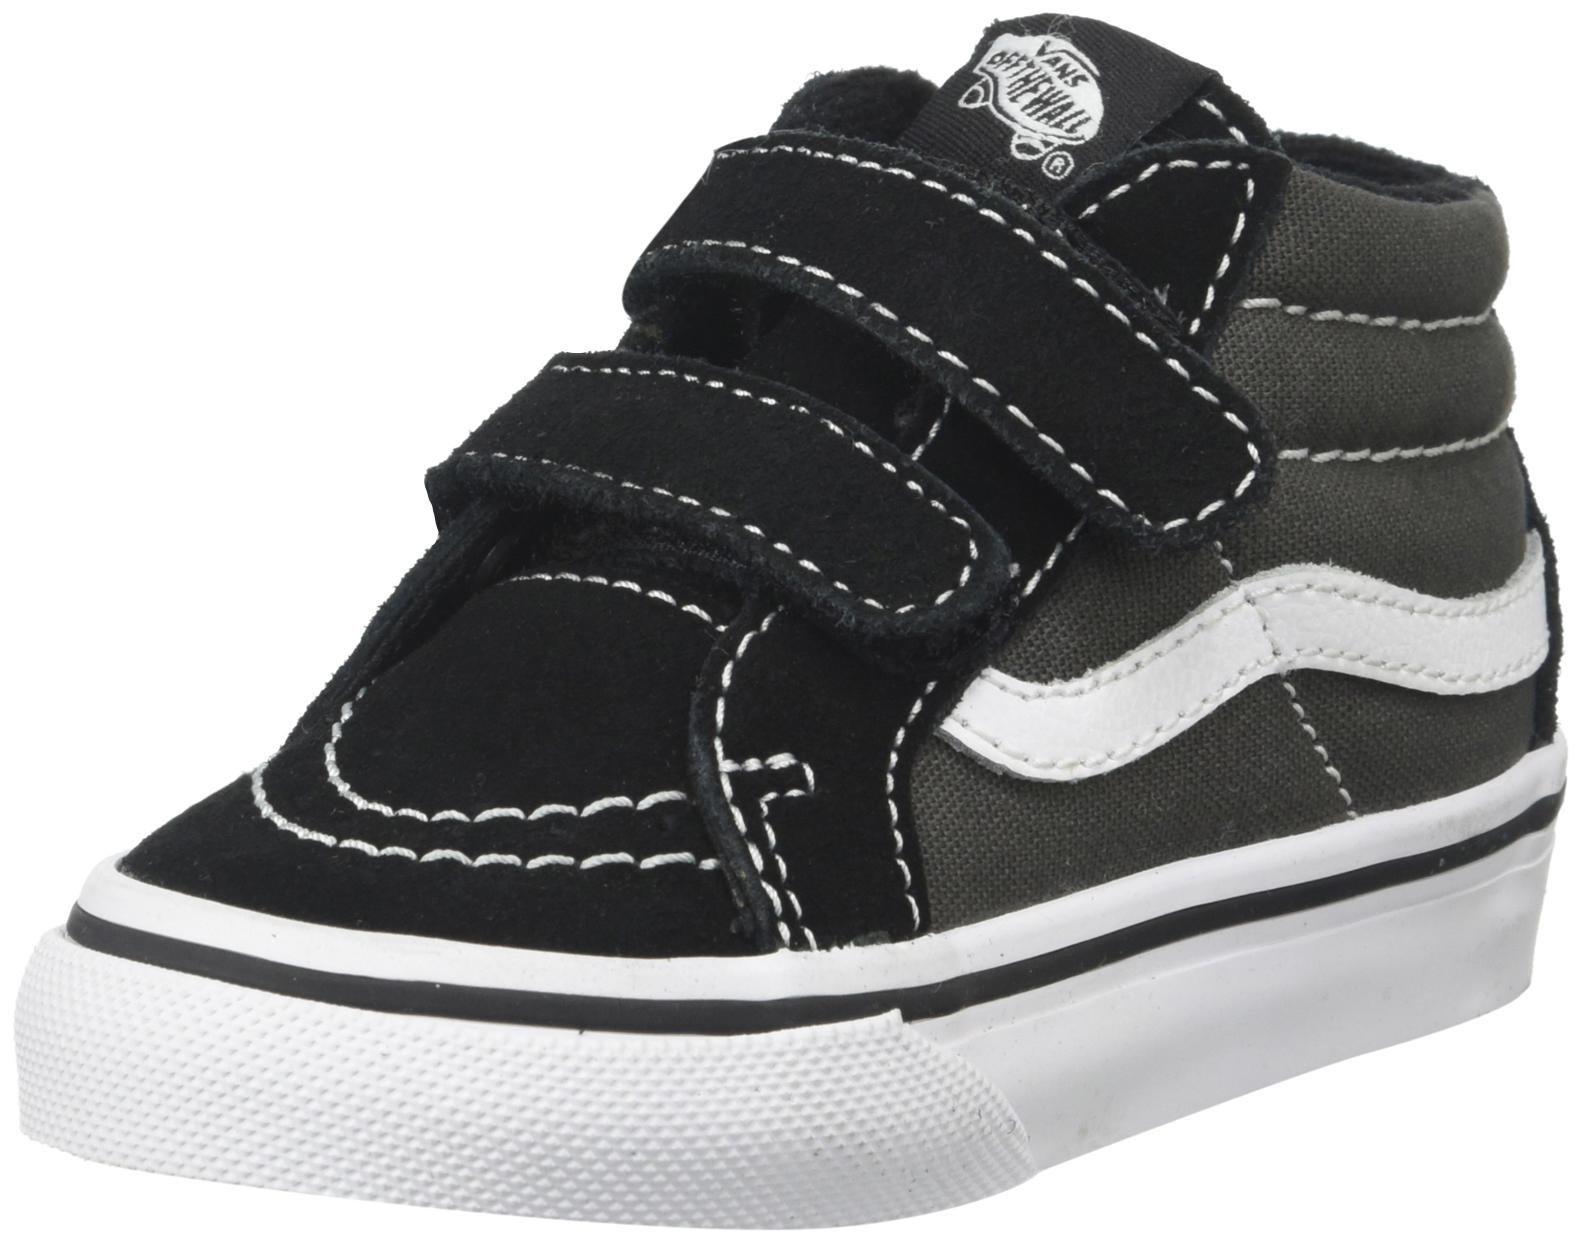 931b925cac Galleon - Vans Era Peanuts Snoopy Skate Shoe (Toddler 5